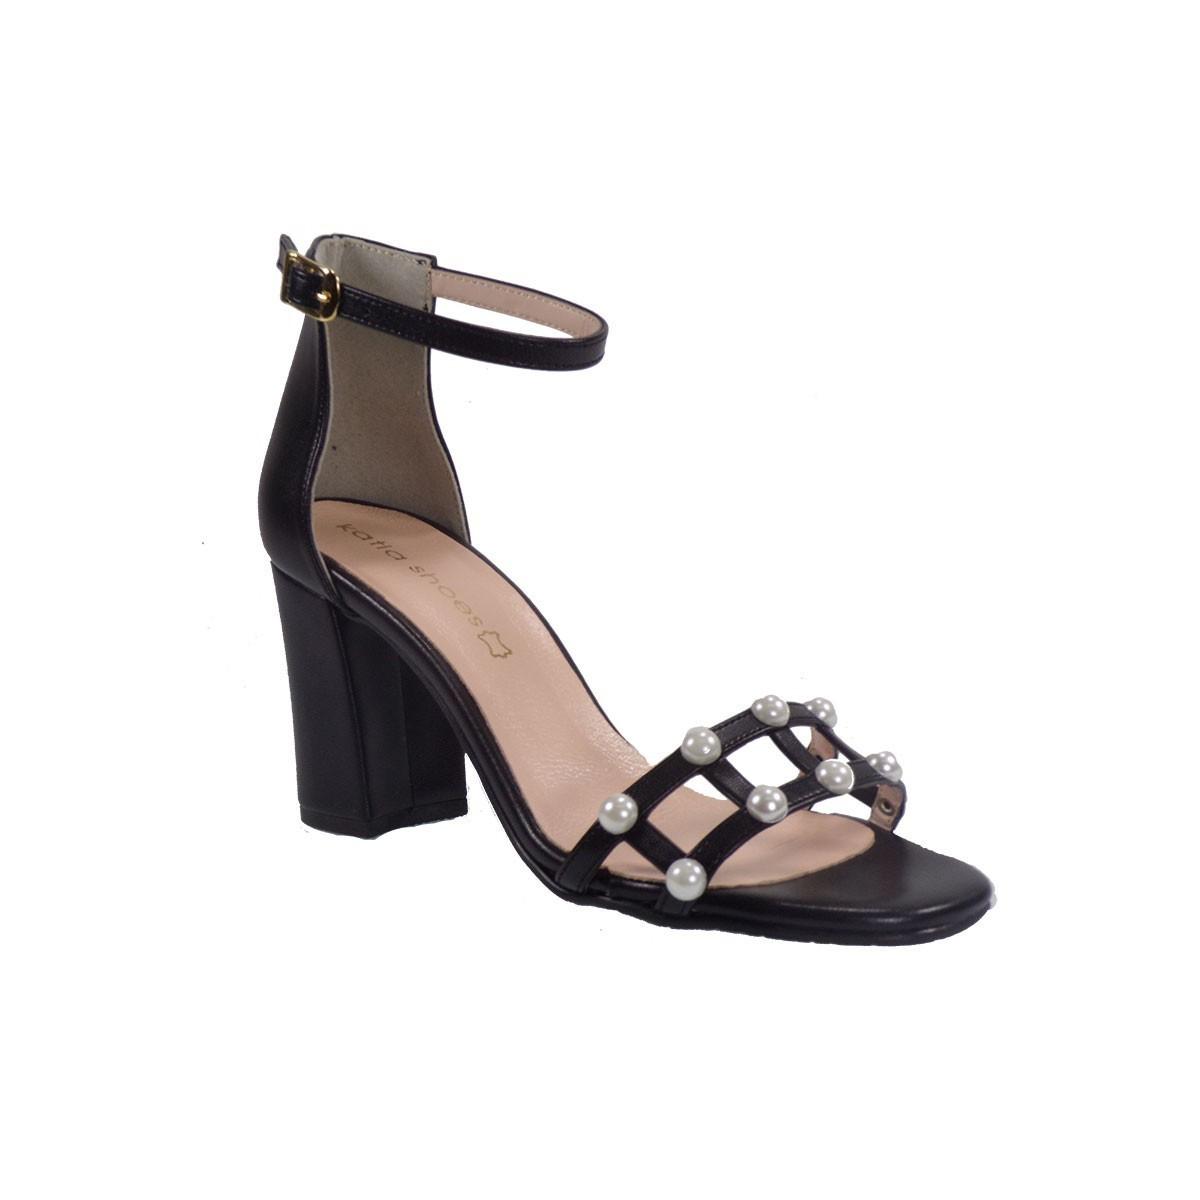 Katia Shoes Γυναικεία Παπούτσια Πέδιλα 35-1787 Μαύρο Ματ